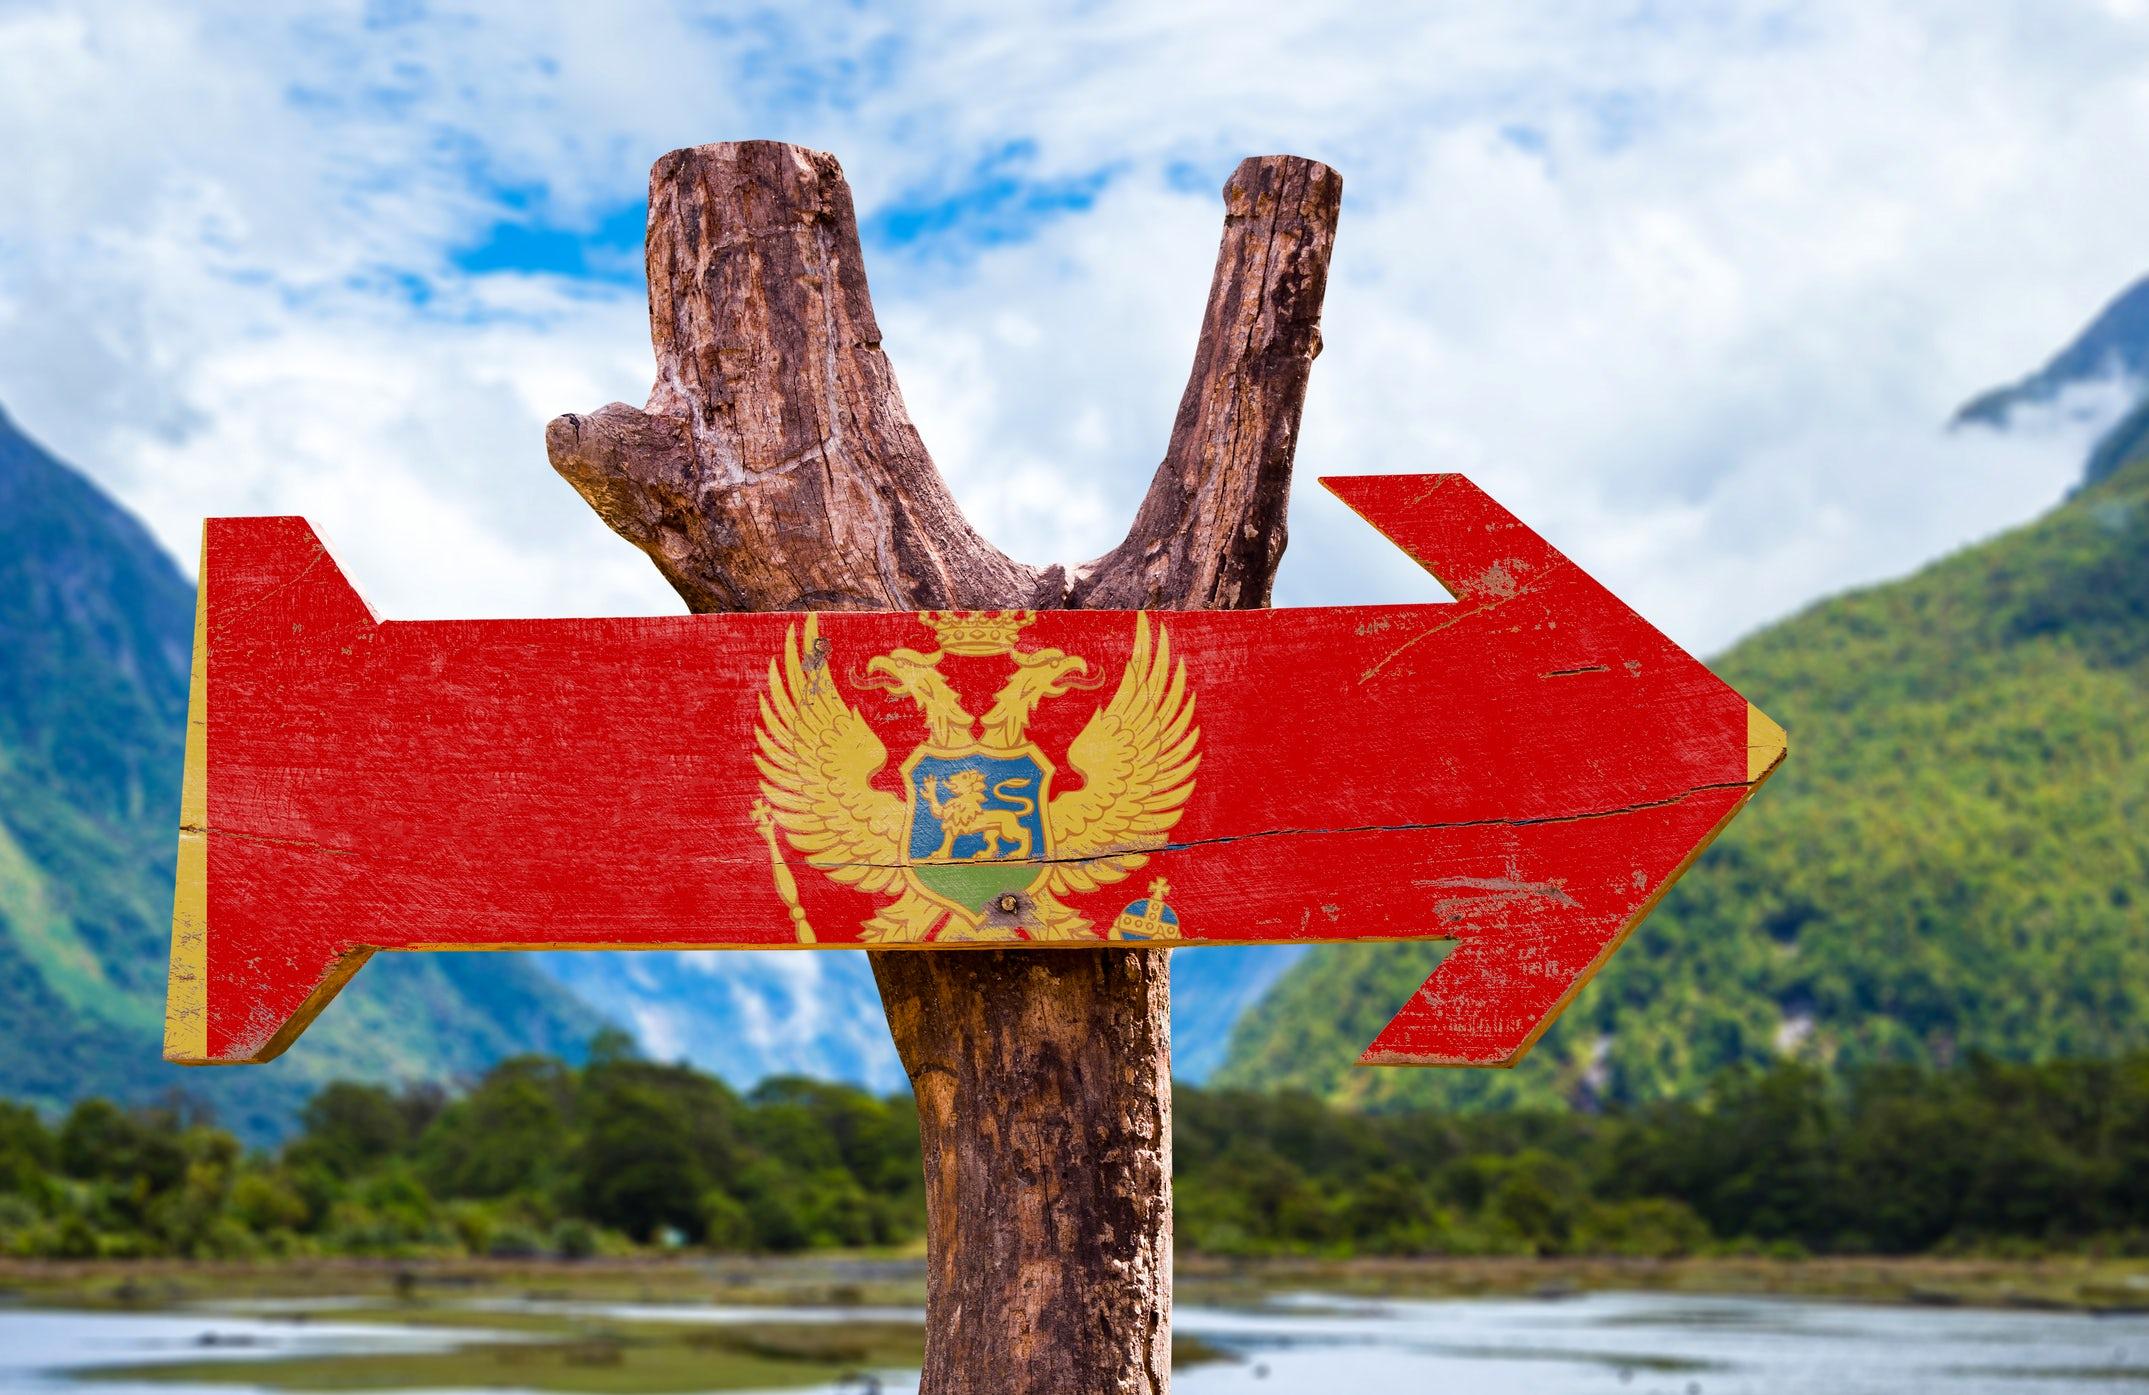 Visit Montenegro: Cities worth visiting - Part I